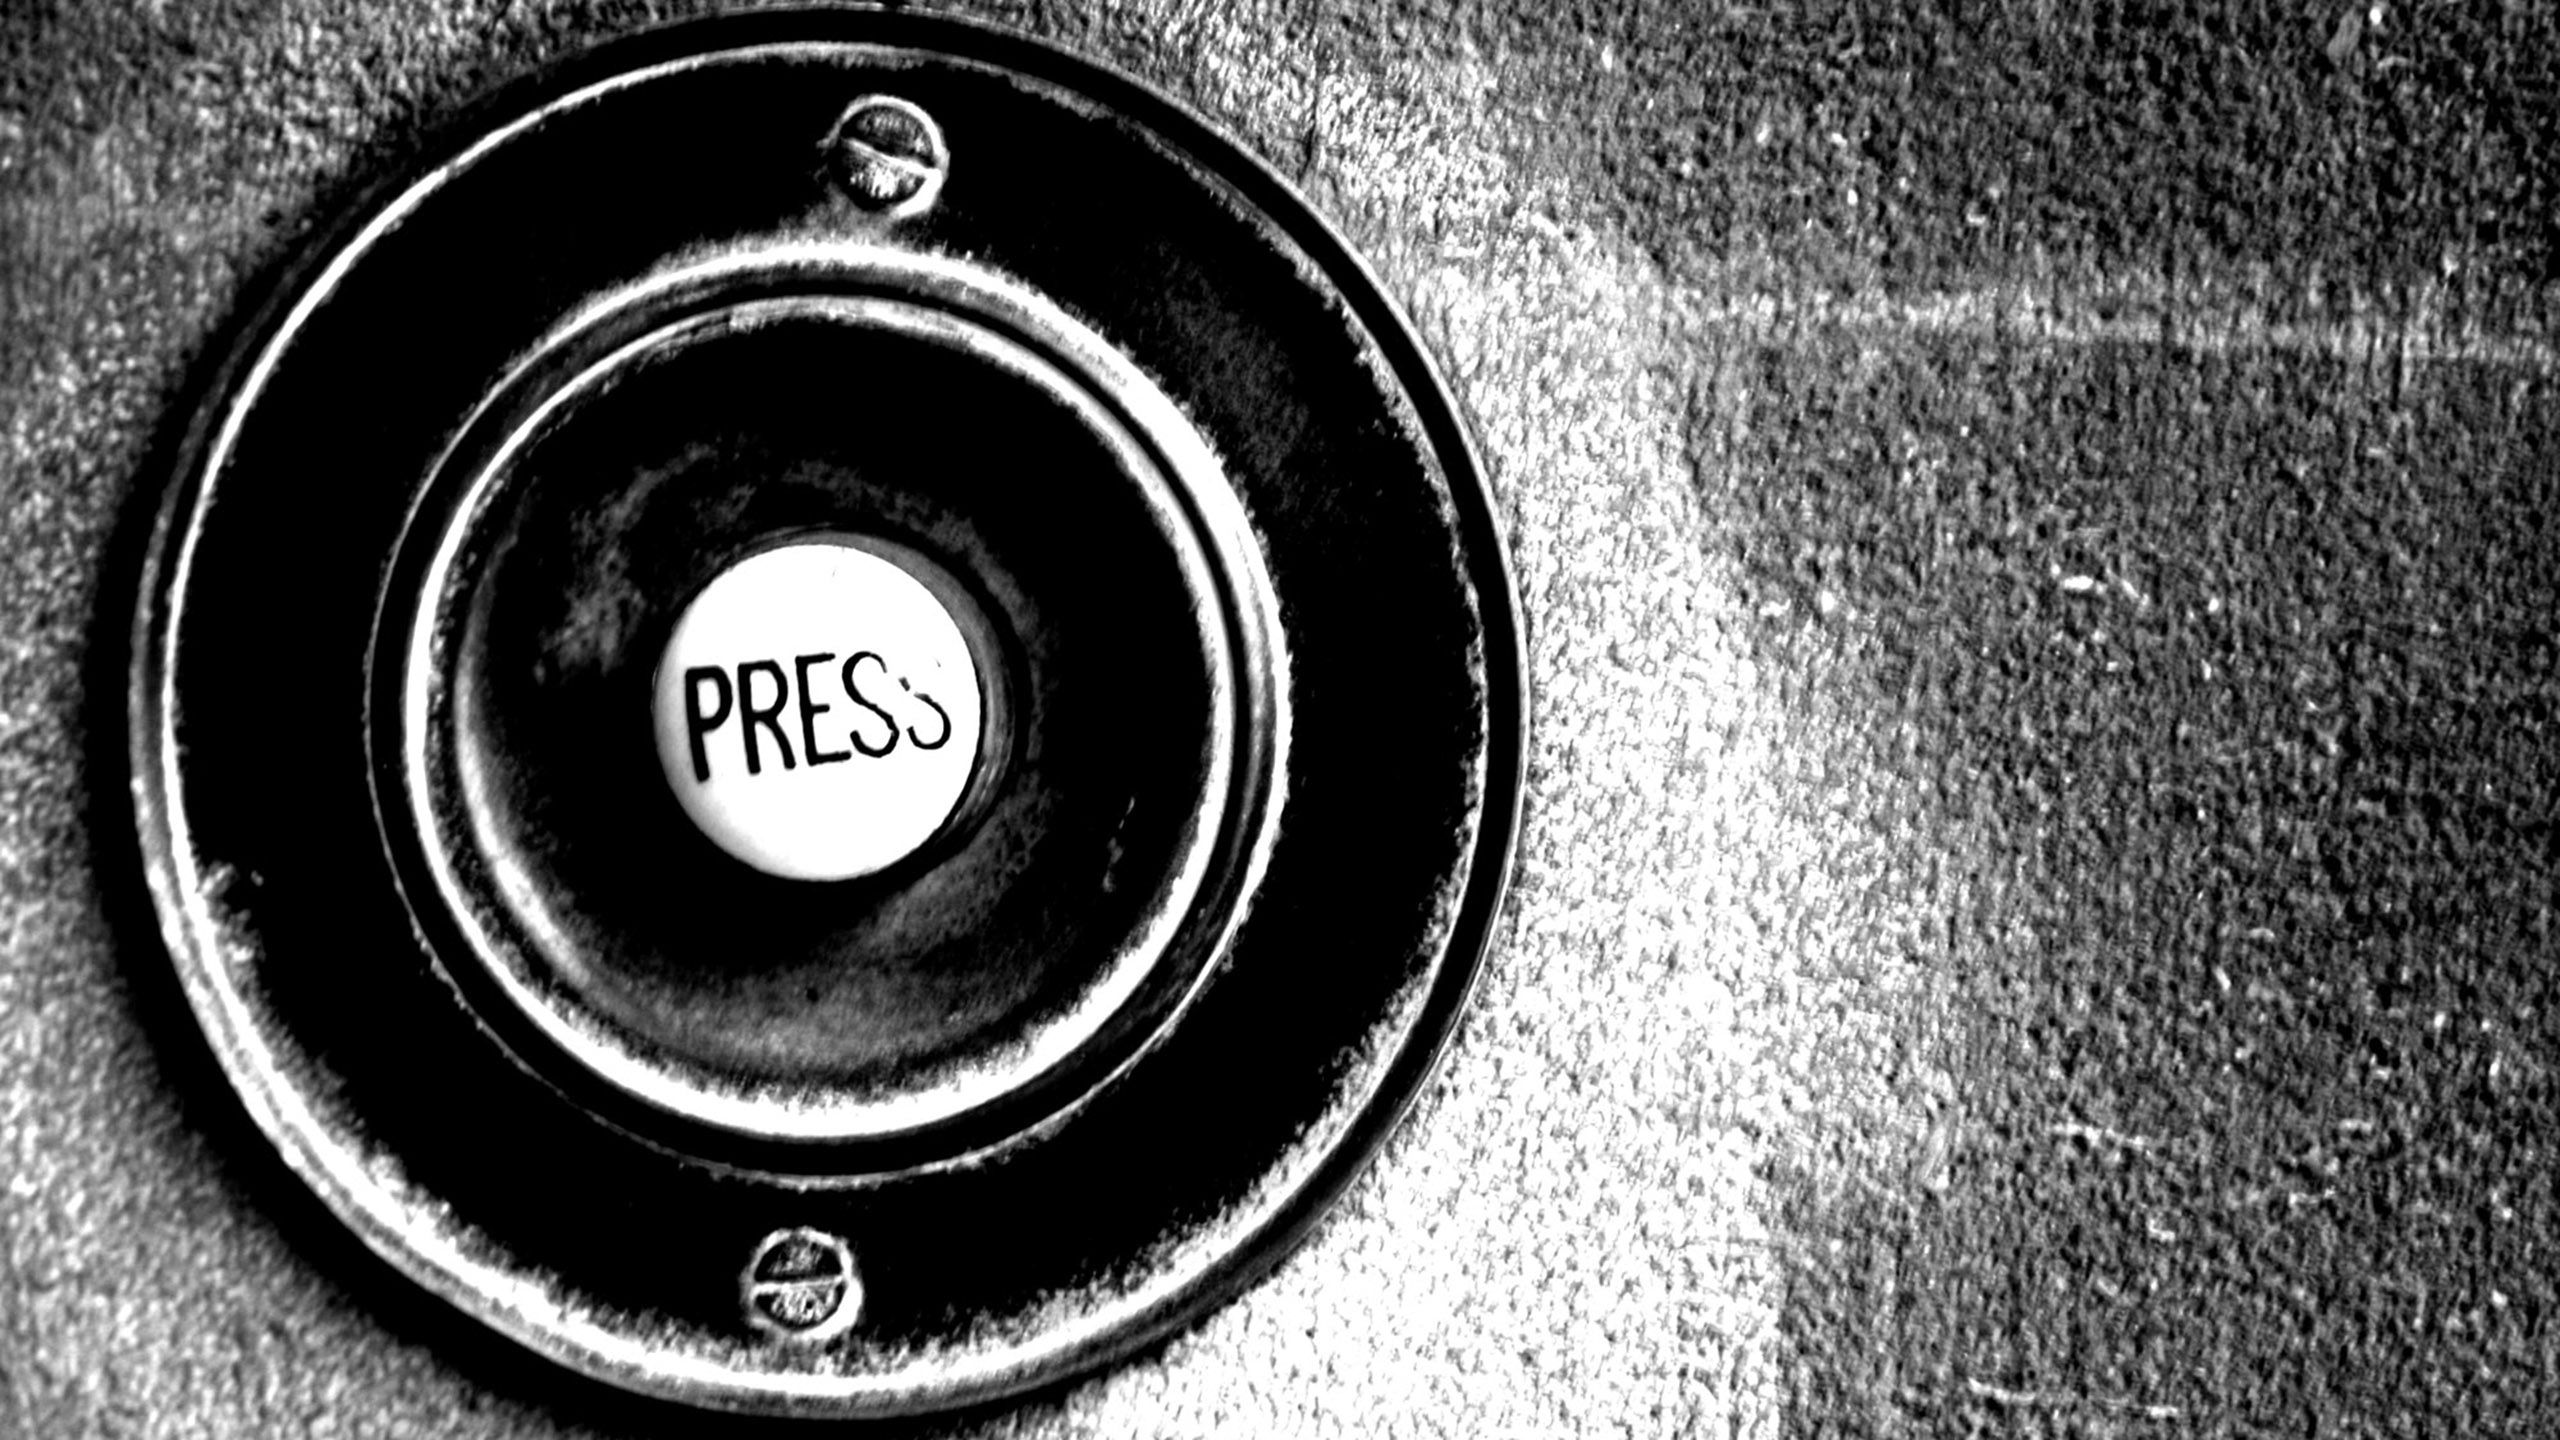 'Press' button